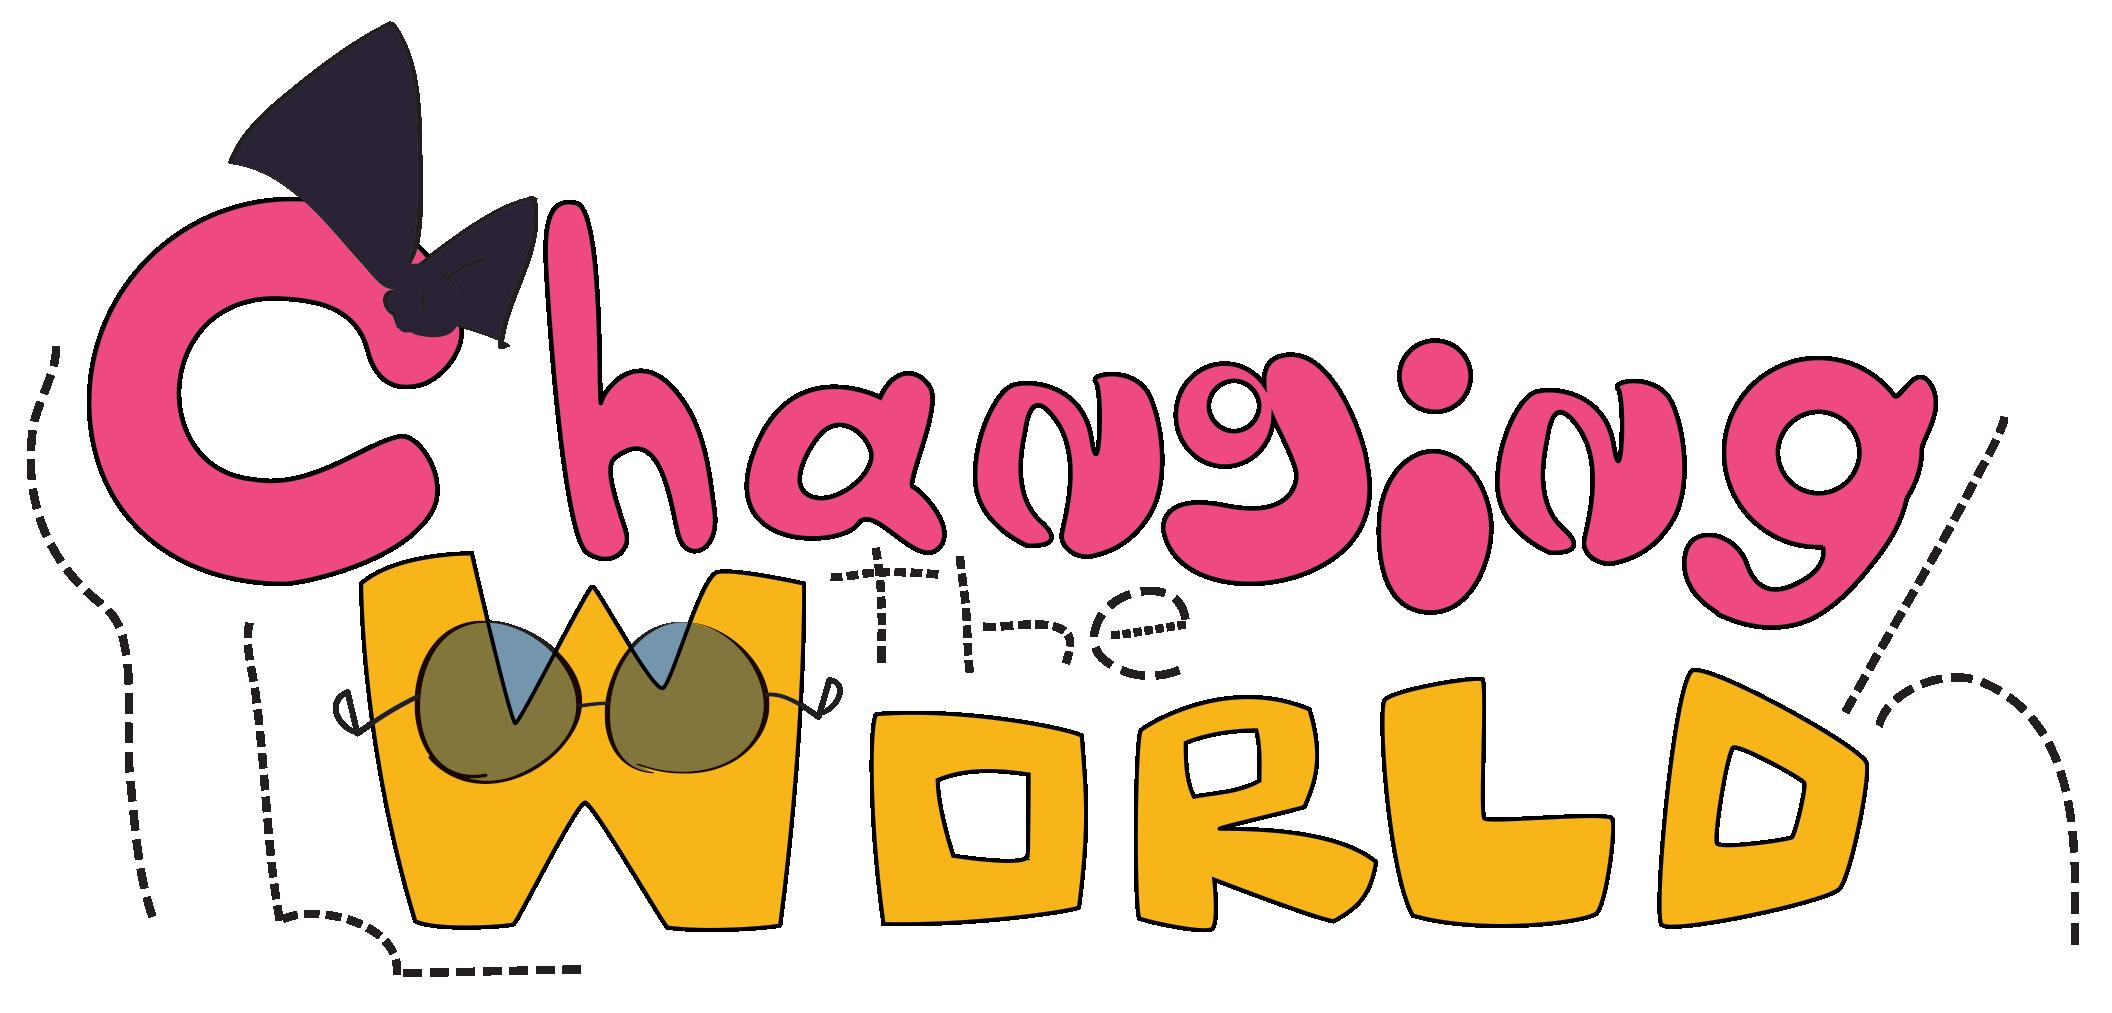 Изменяя Мир (Changing the World) игра про любовь на Android. Или как круг и квадрат влюбились - Изображение 2